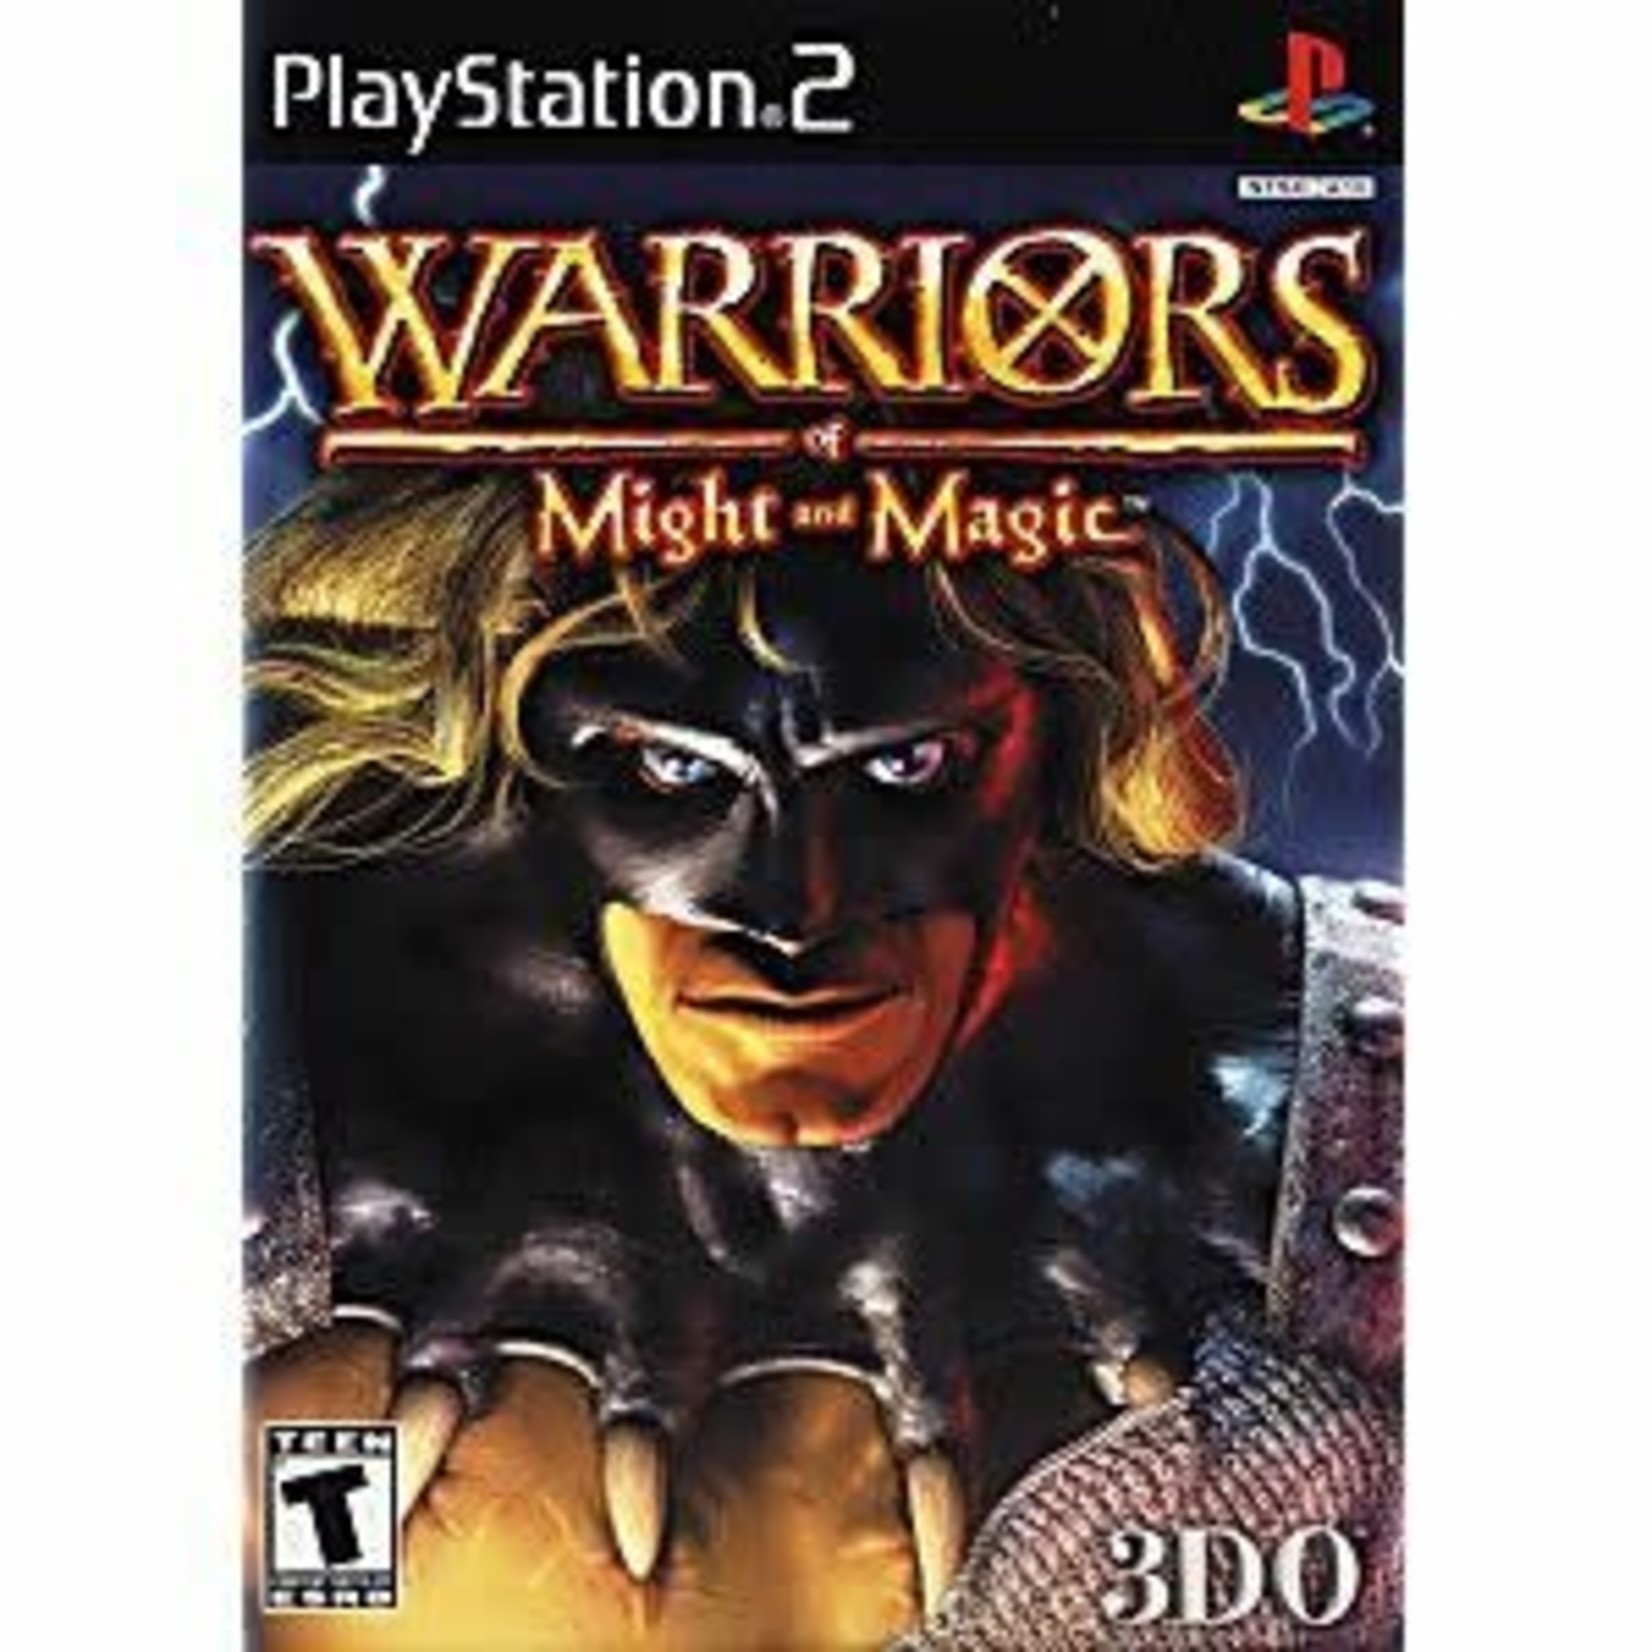 PS2U-WARRIORS OF MIGHT AND MAGIC